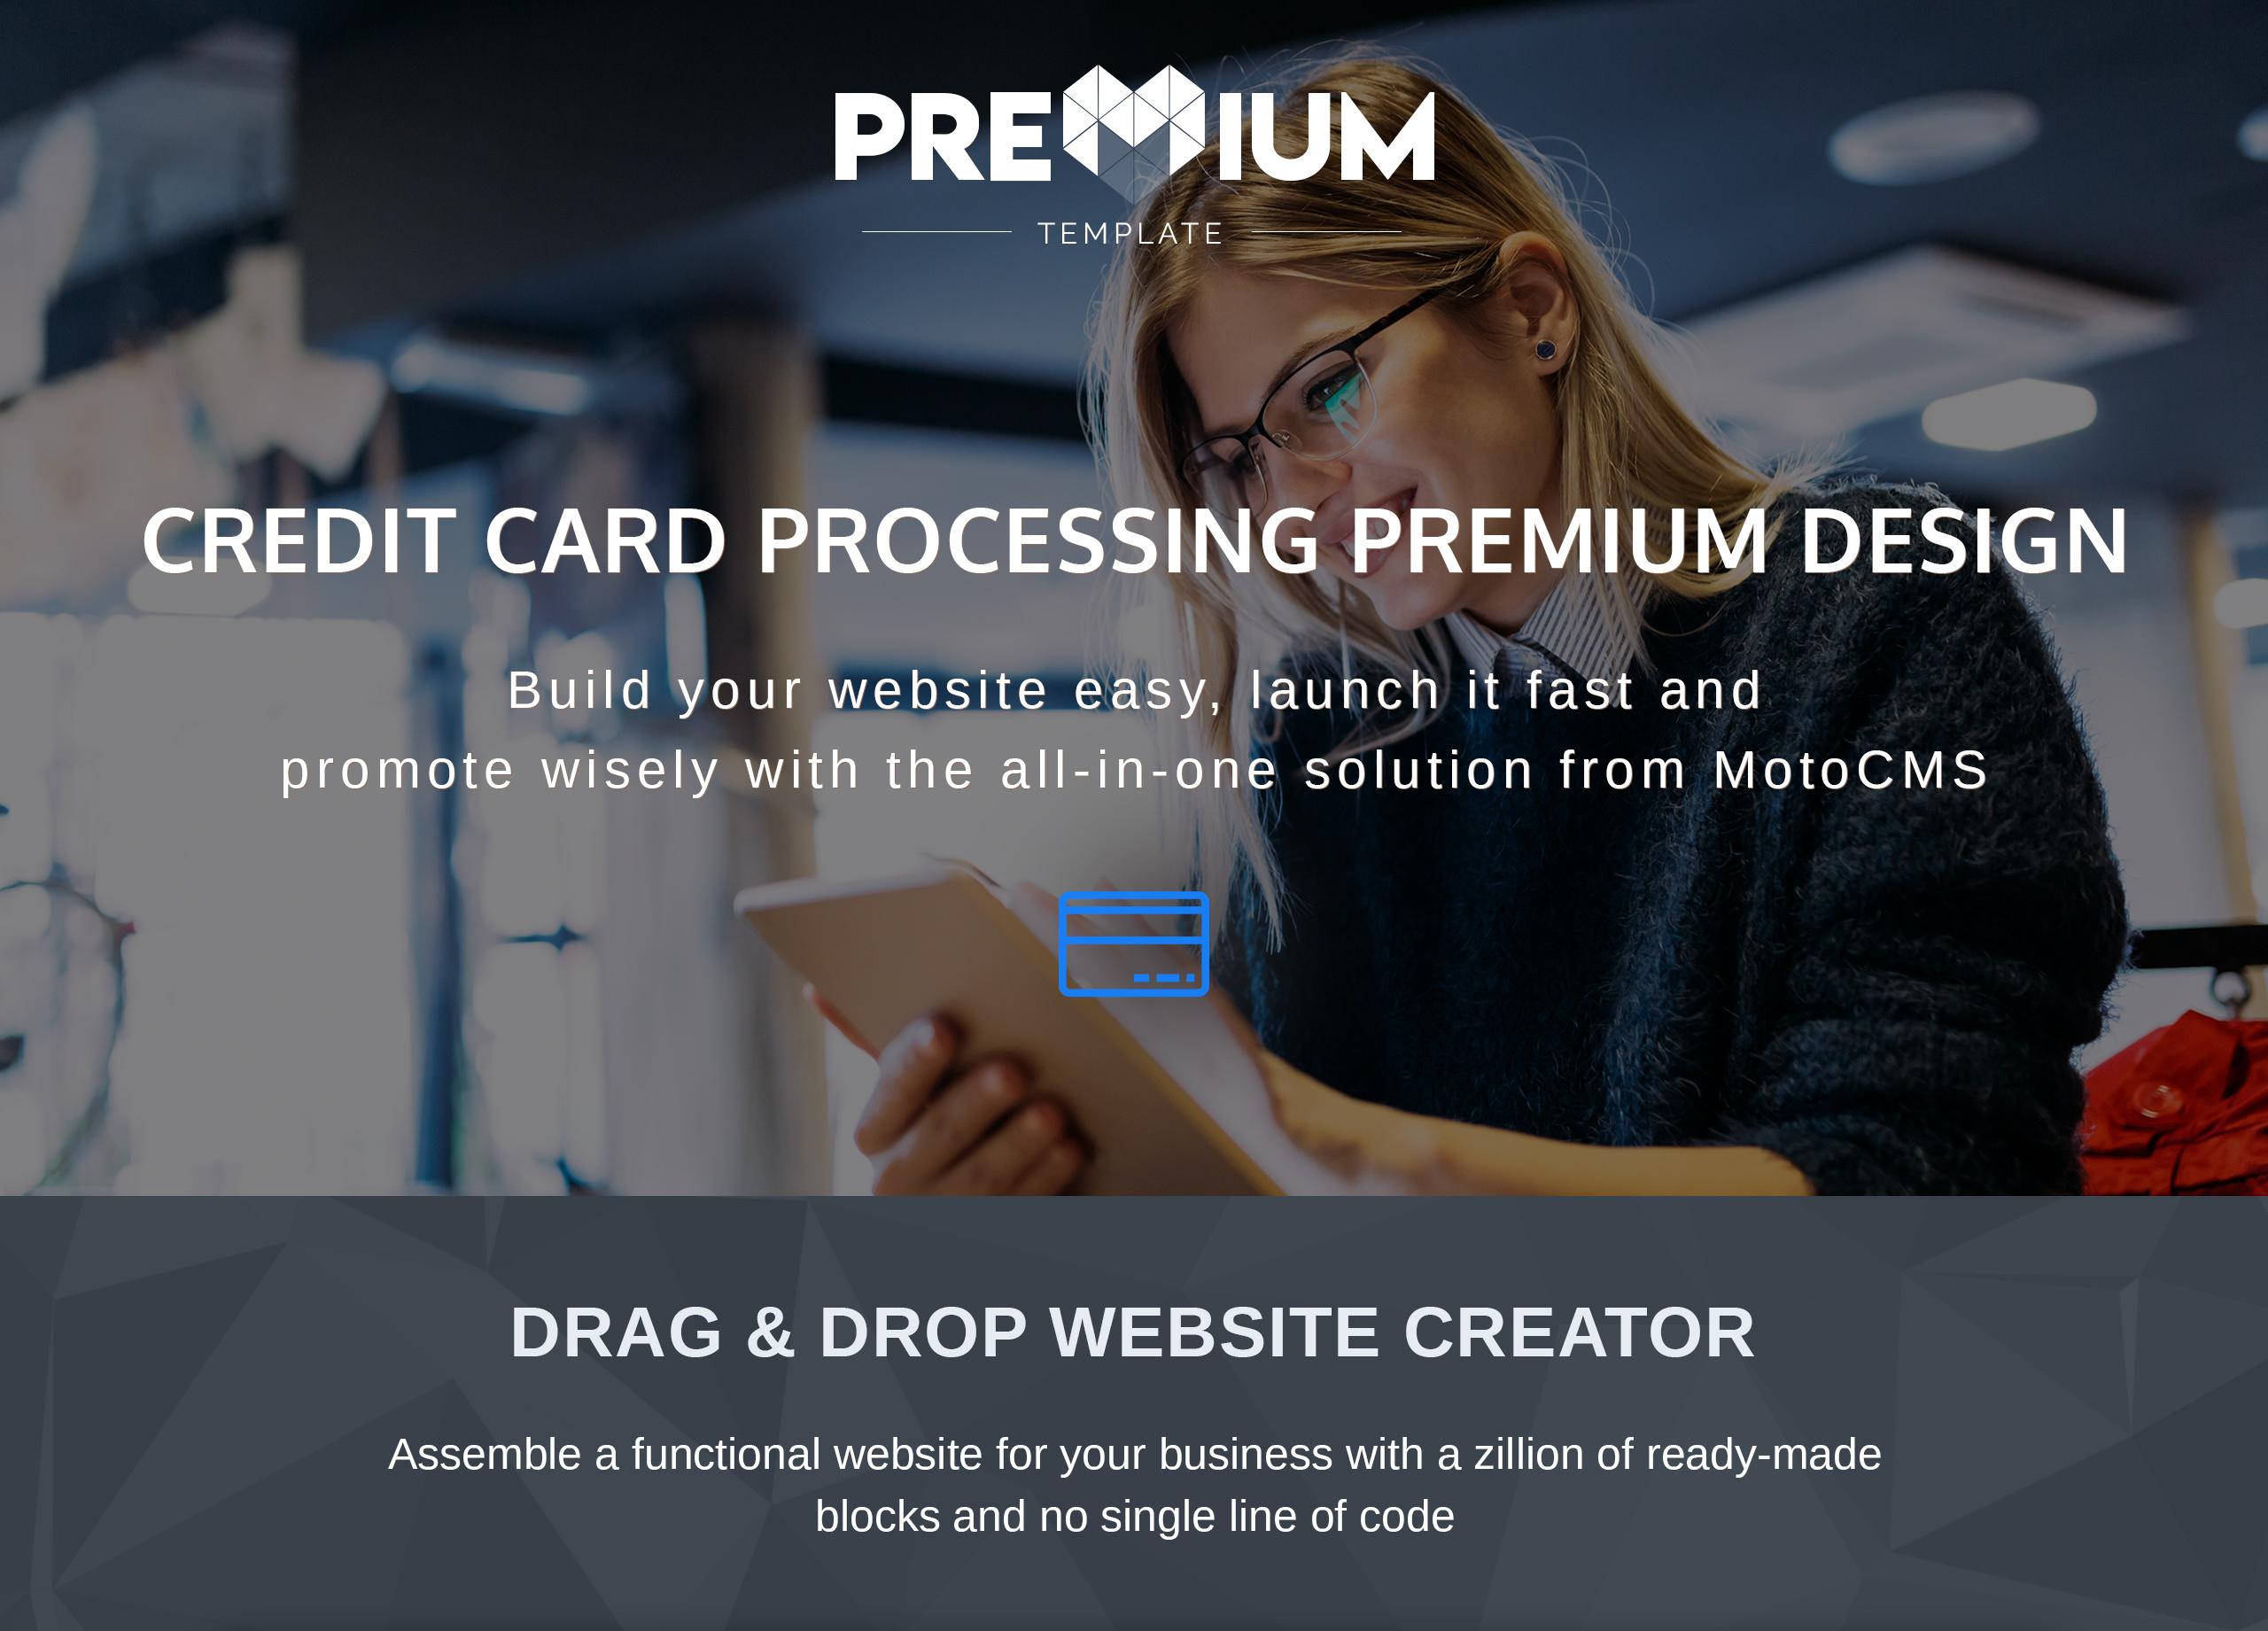 Billfold - Credit Card Processing Premium Moto CMS 3 Template